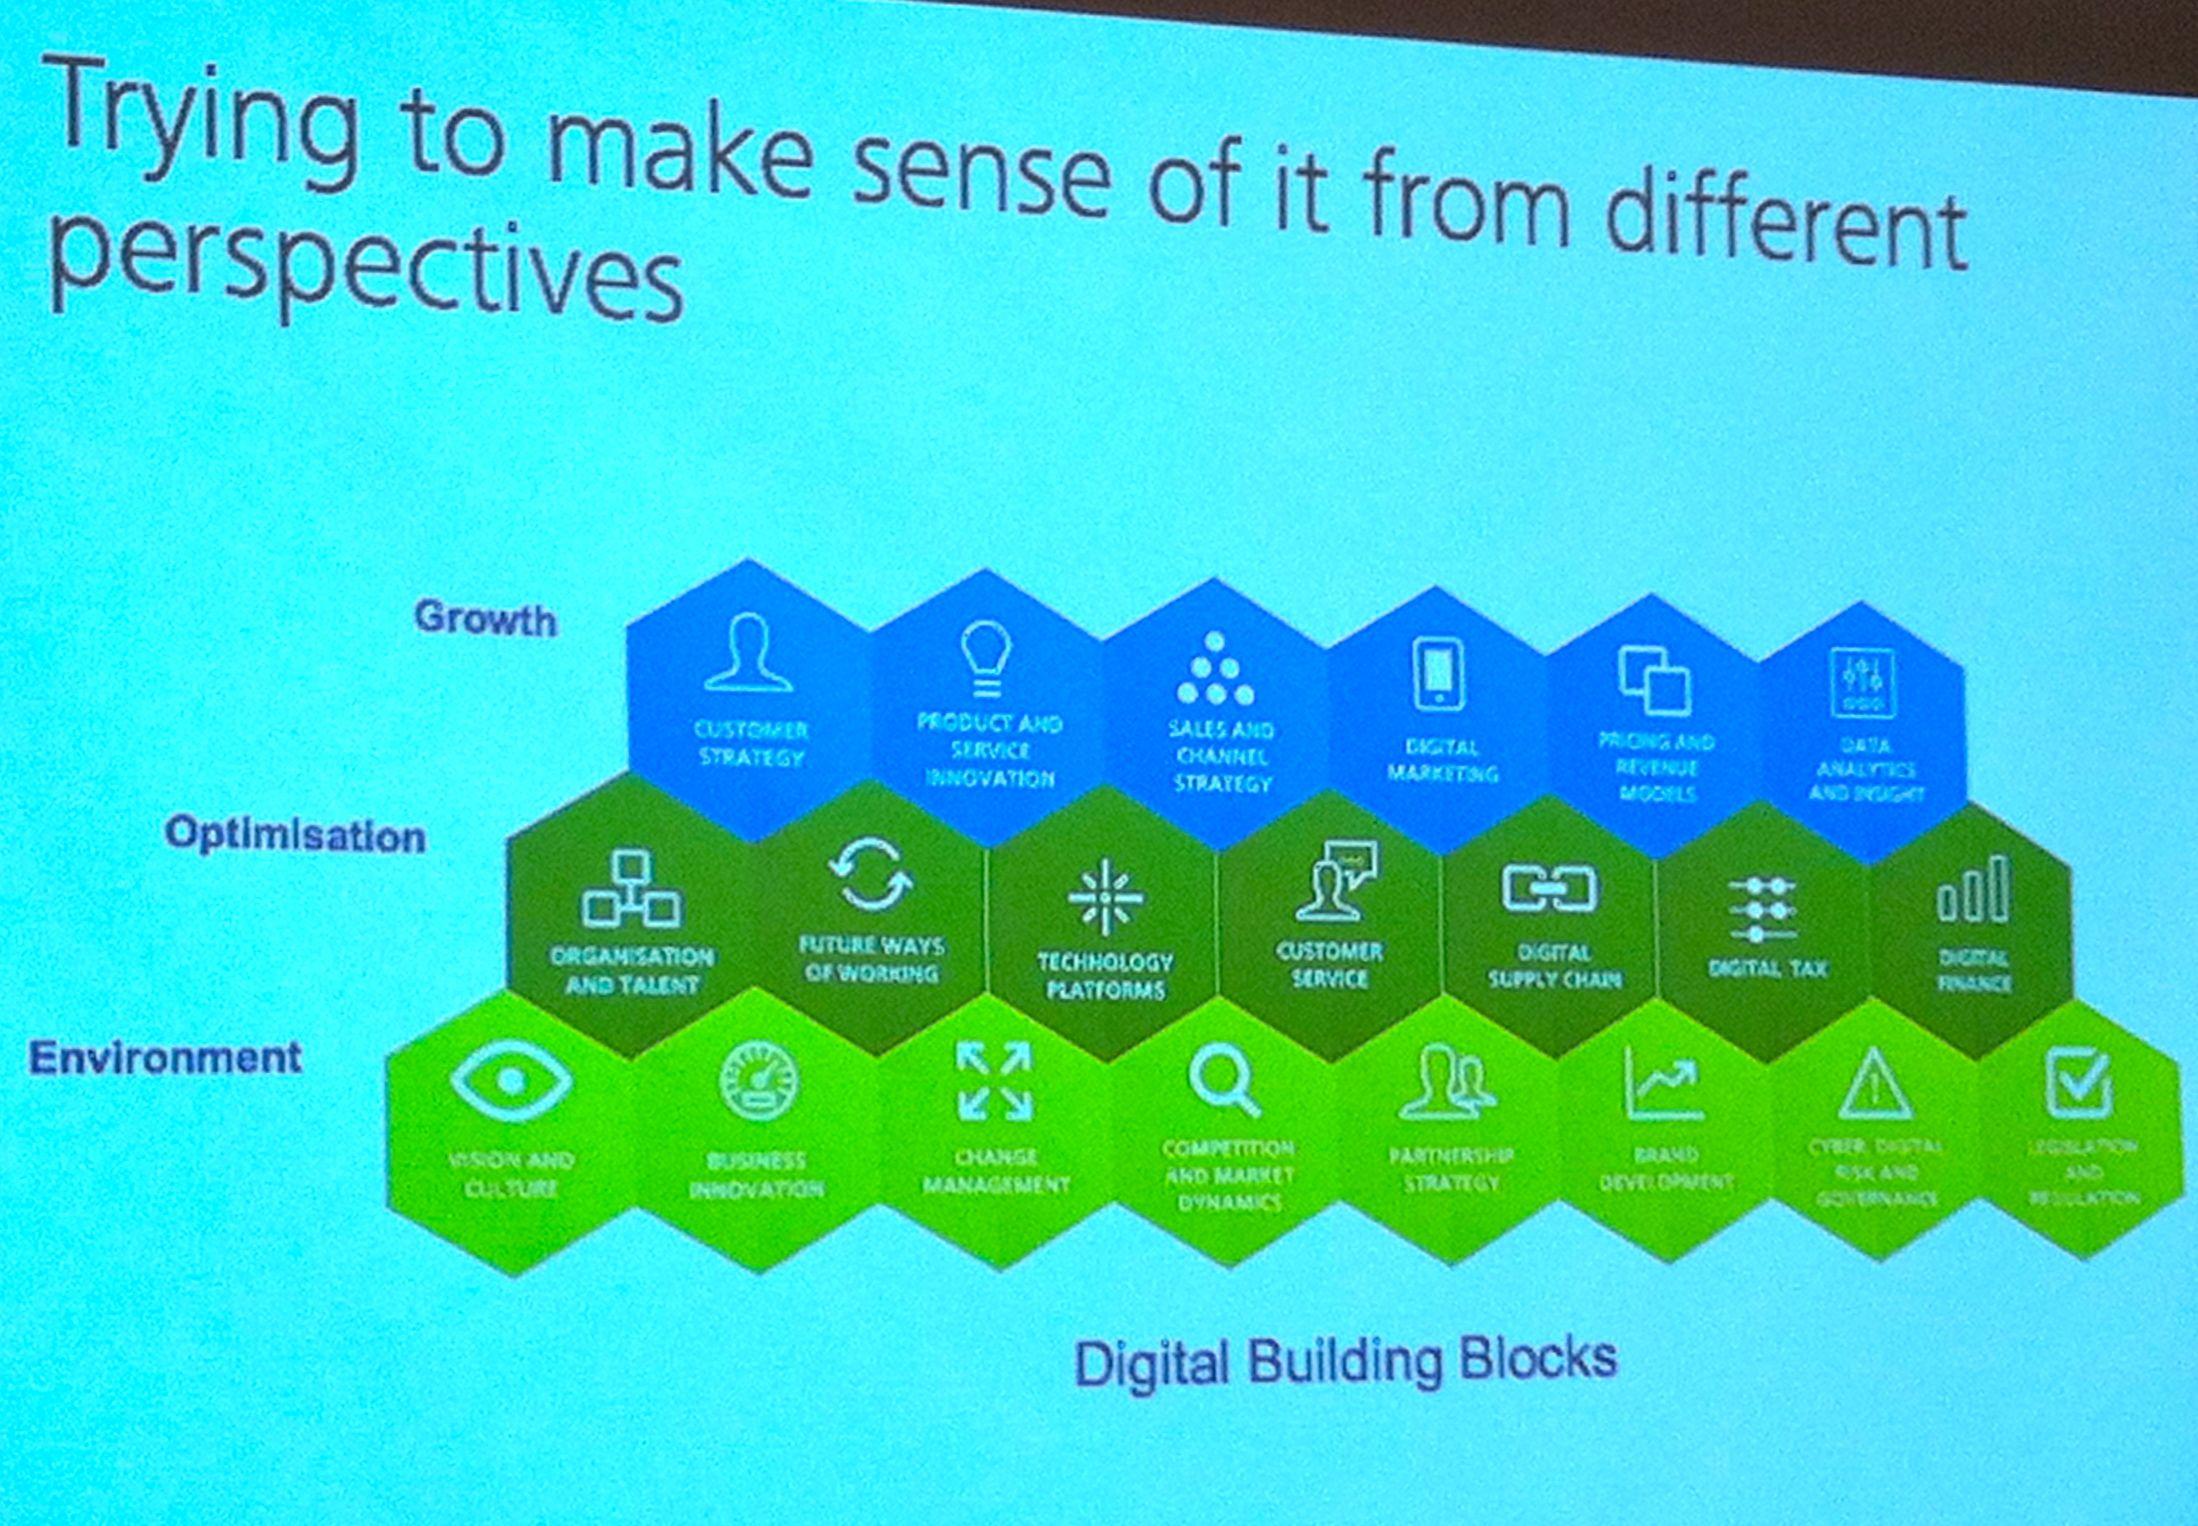 Deloitte Digital - Different perspectives on digital disruption